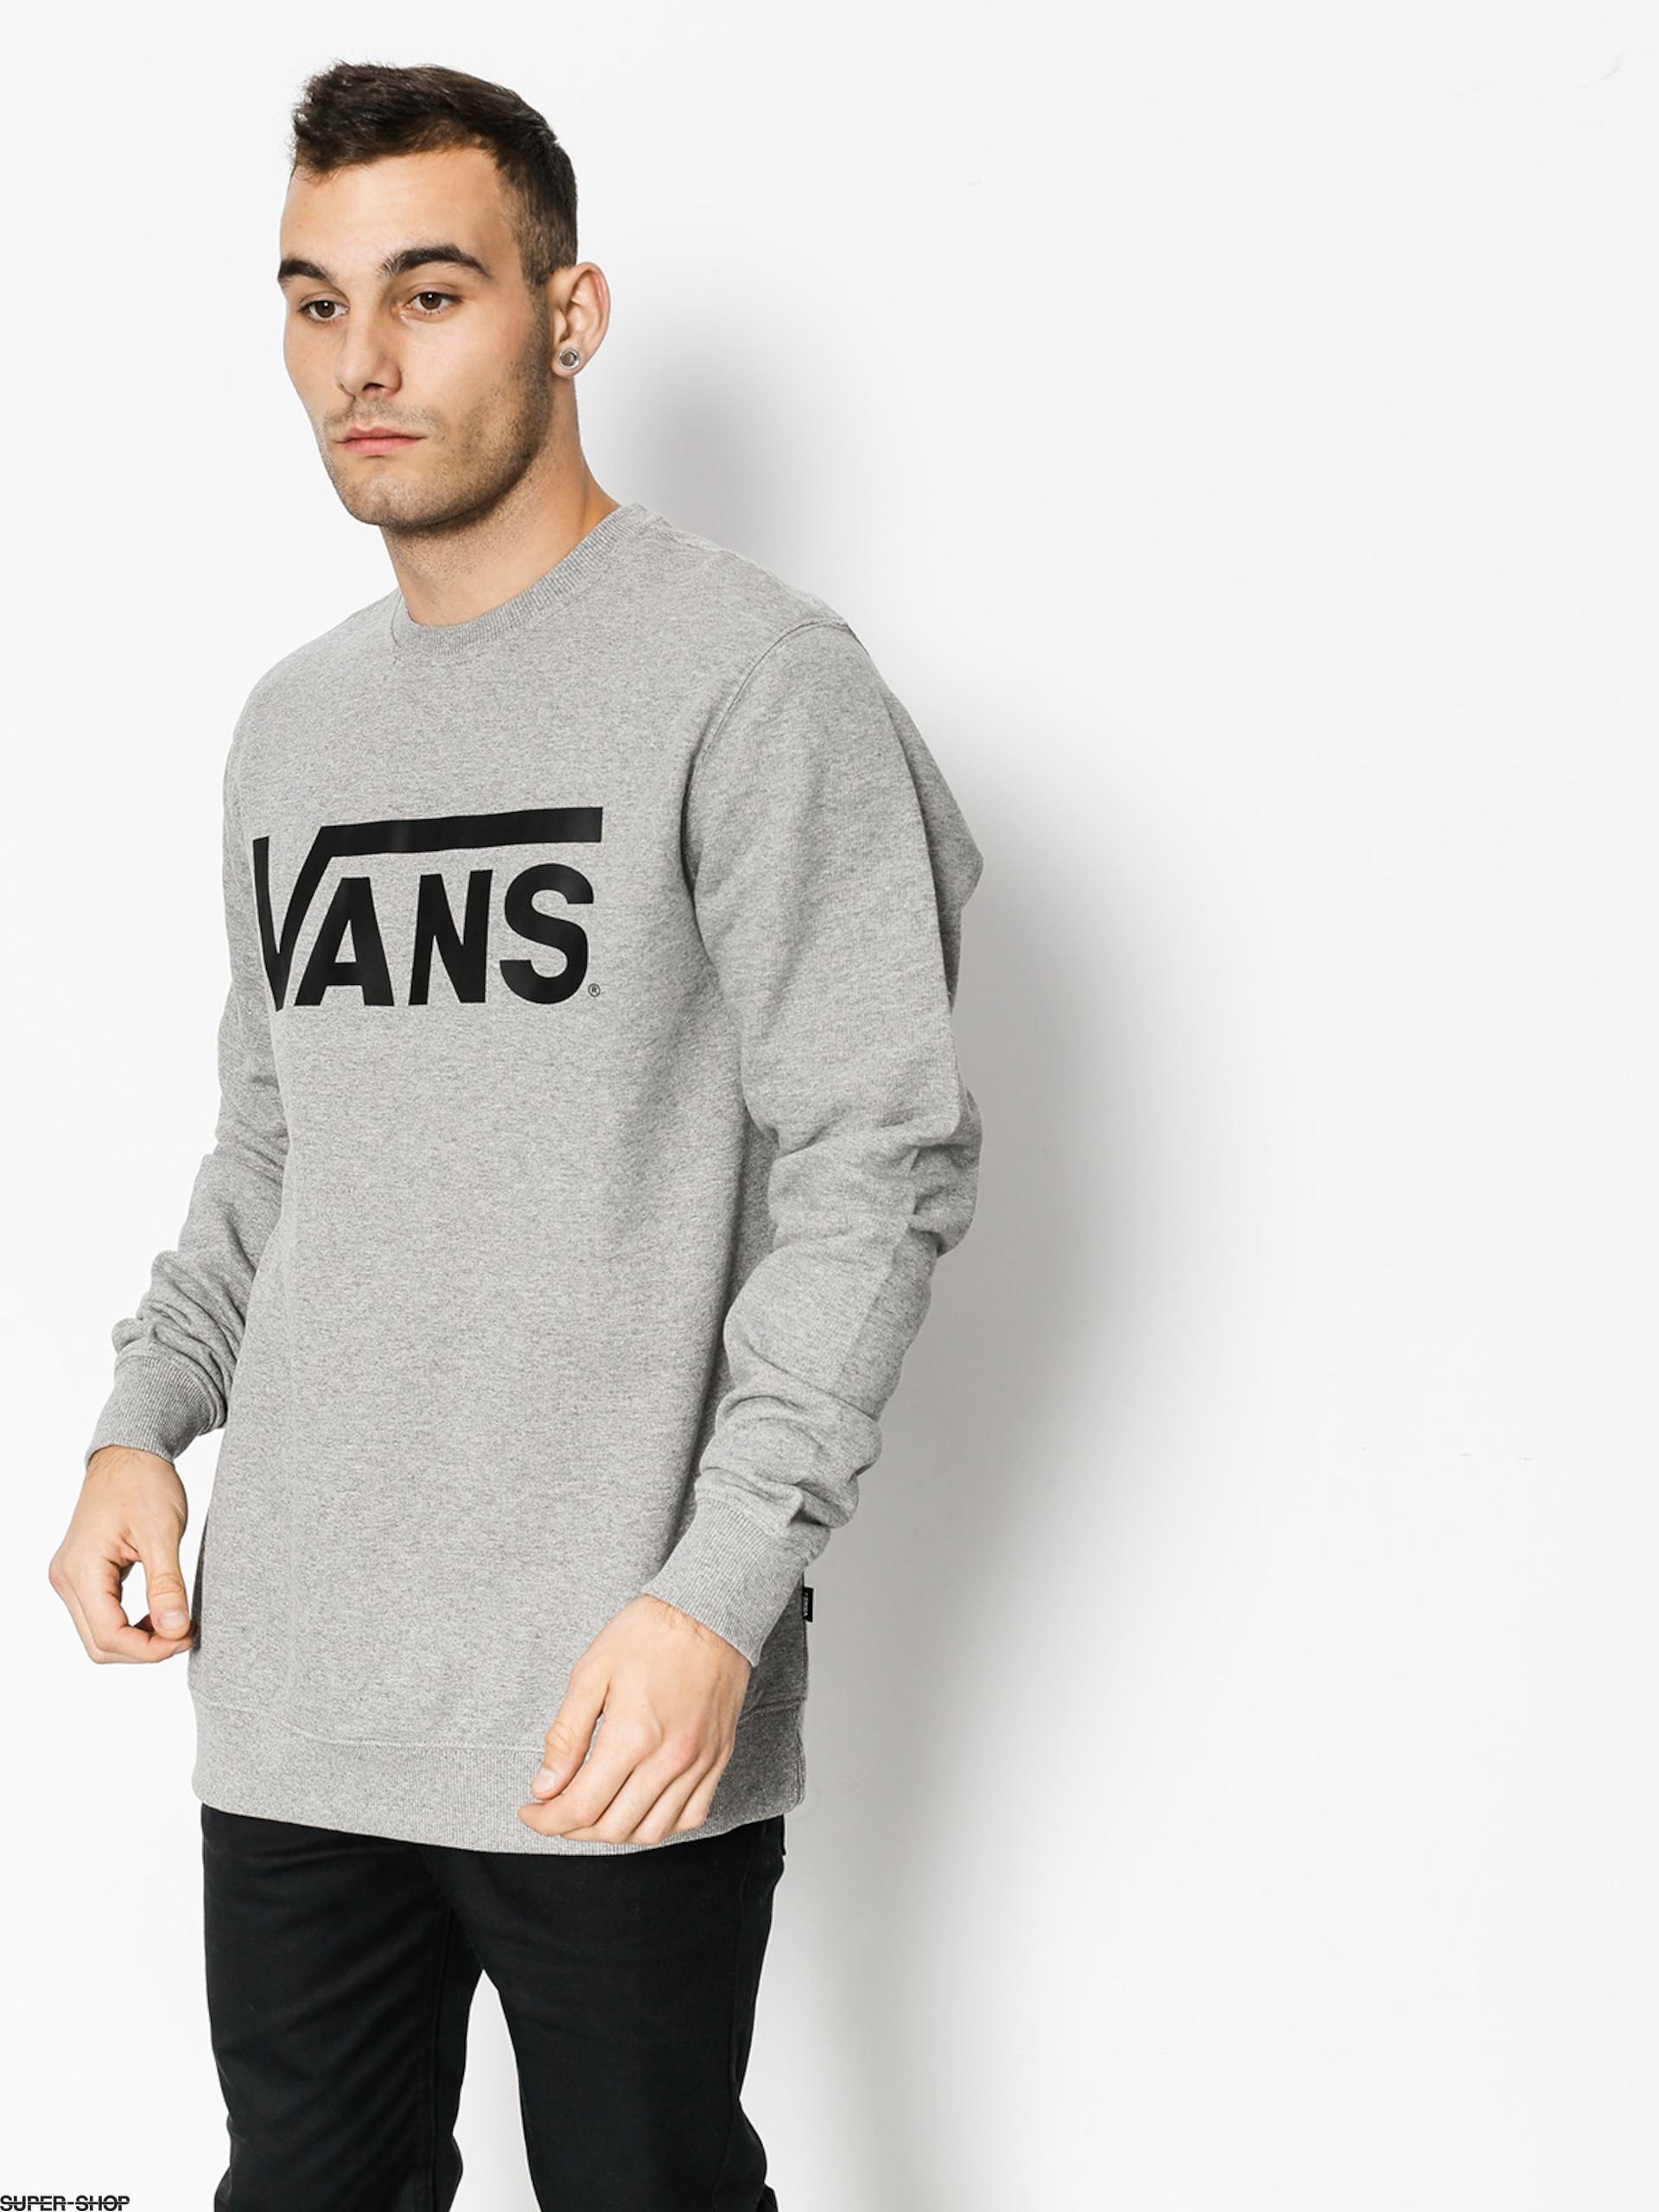 448157cedac3 Vans Sweatshirt Classic Crew (concrete heather black)